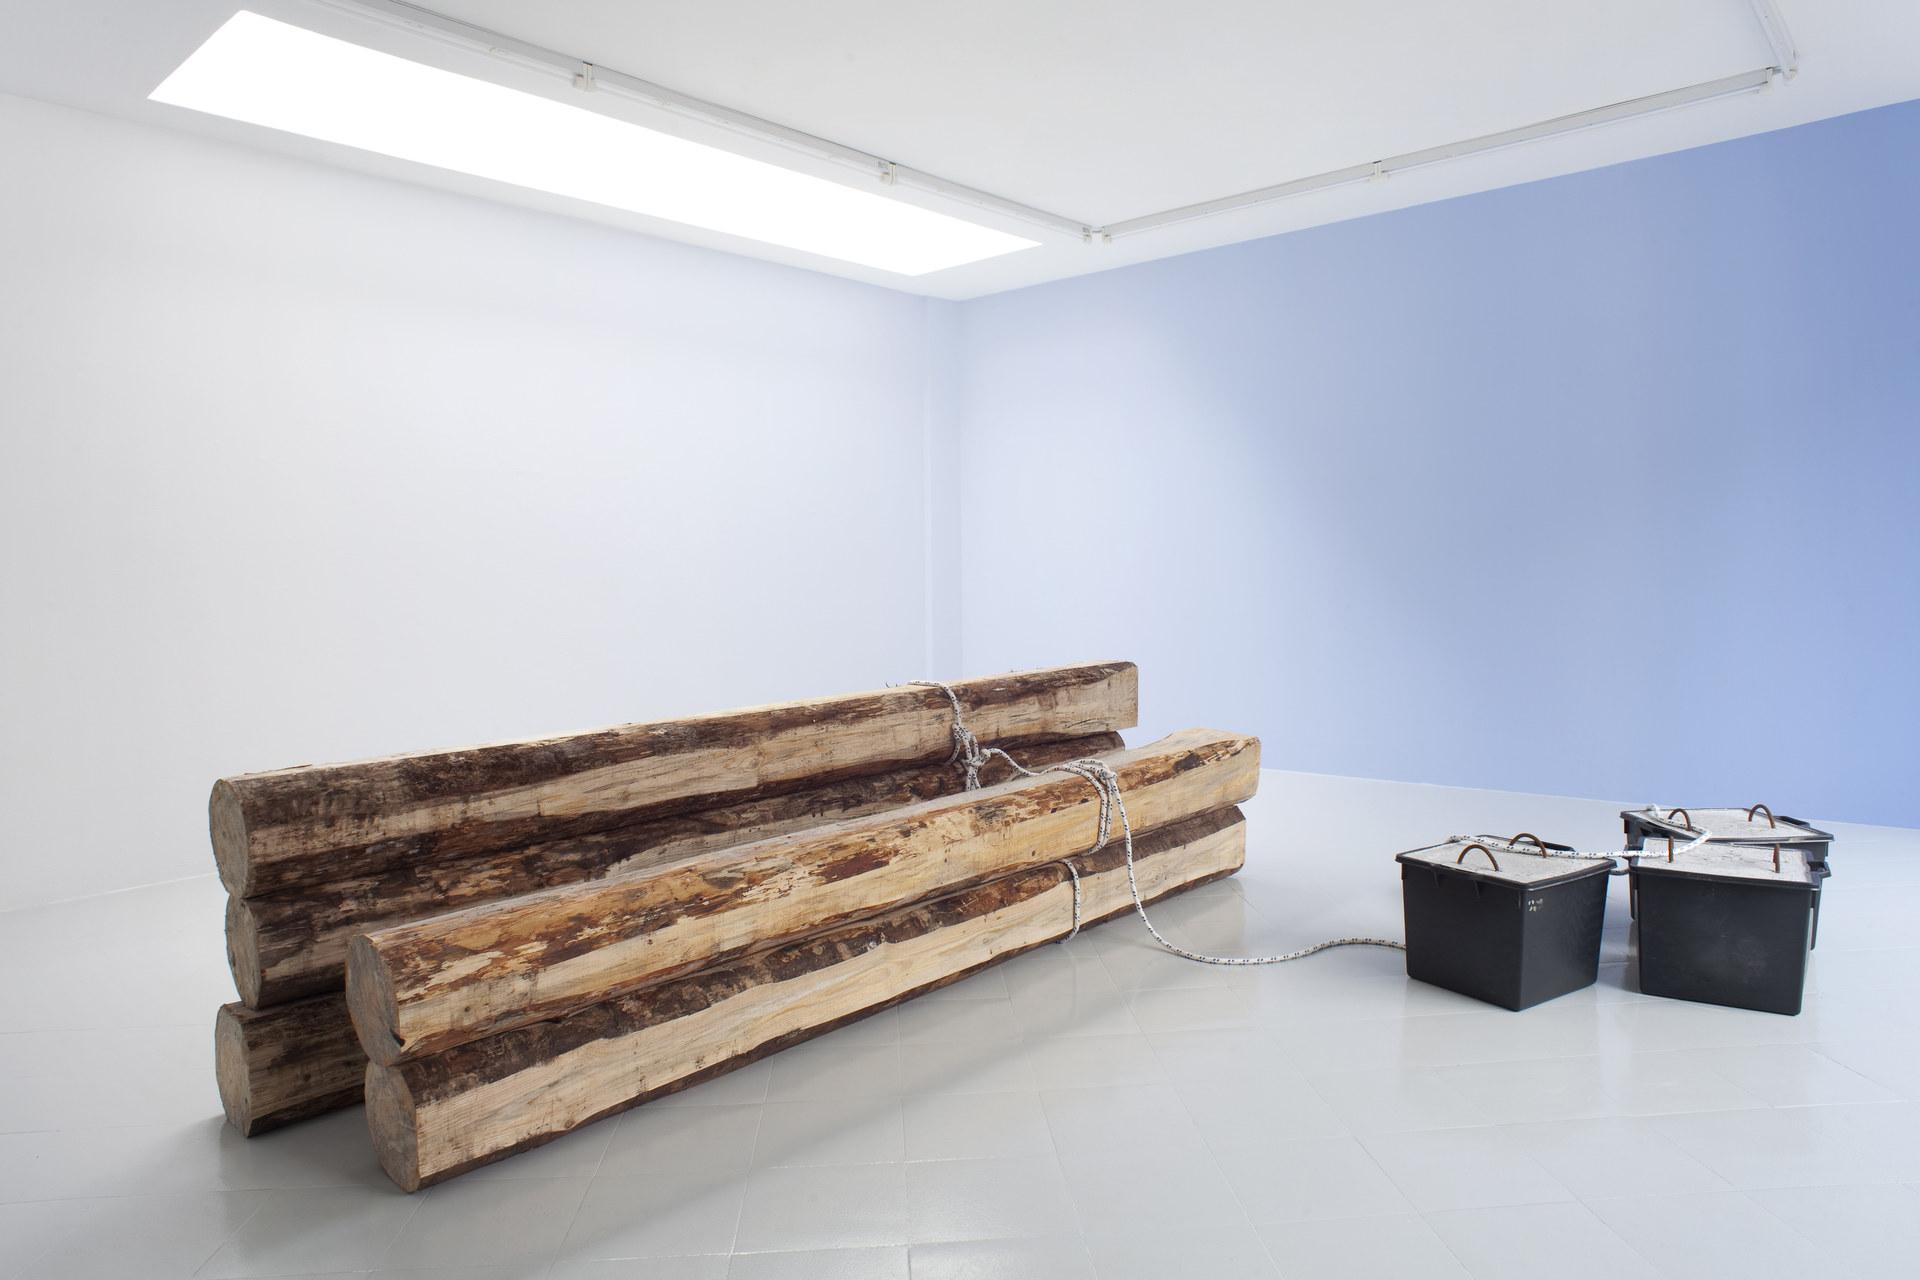 2 - Karsten Fo¦êdinger, Pieter Vermeersch, Installation View, 2015, Cabinet, Milano - Courtesy Artists and Cabinet, Milan, Photo Filippo Armellin